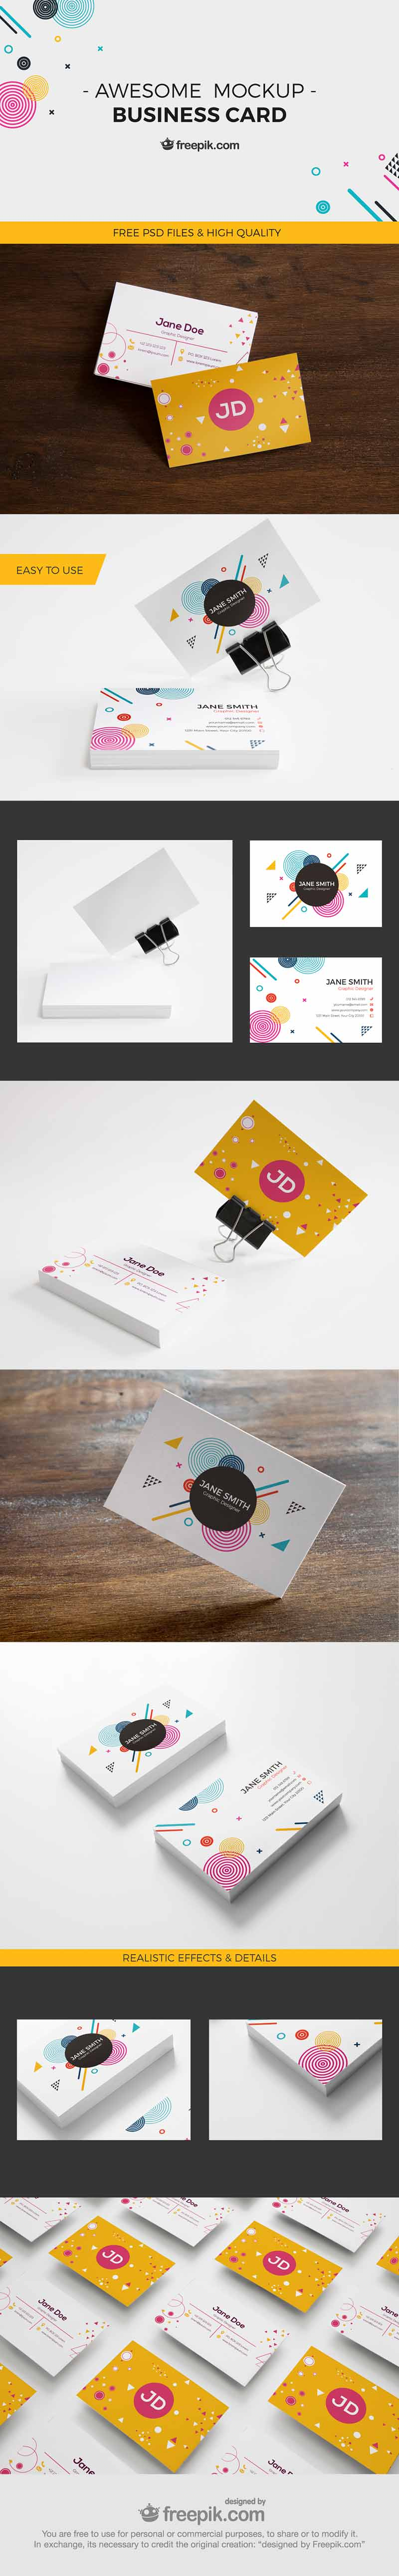 Awesome Business Card Mockup Design - Sample